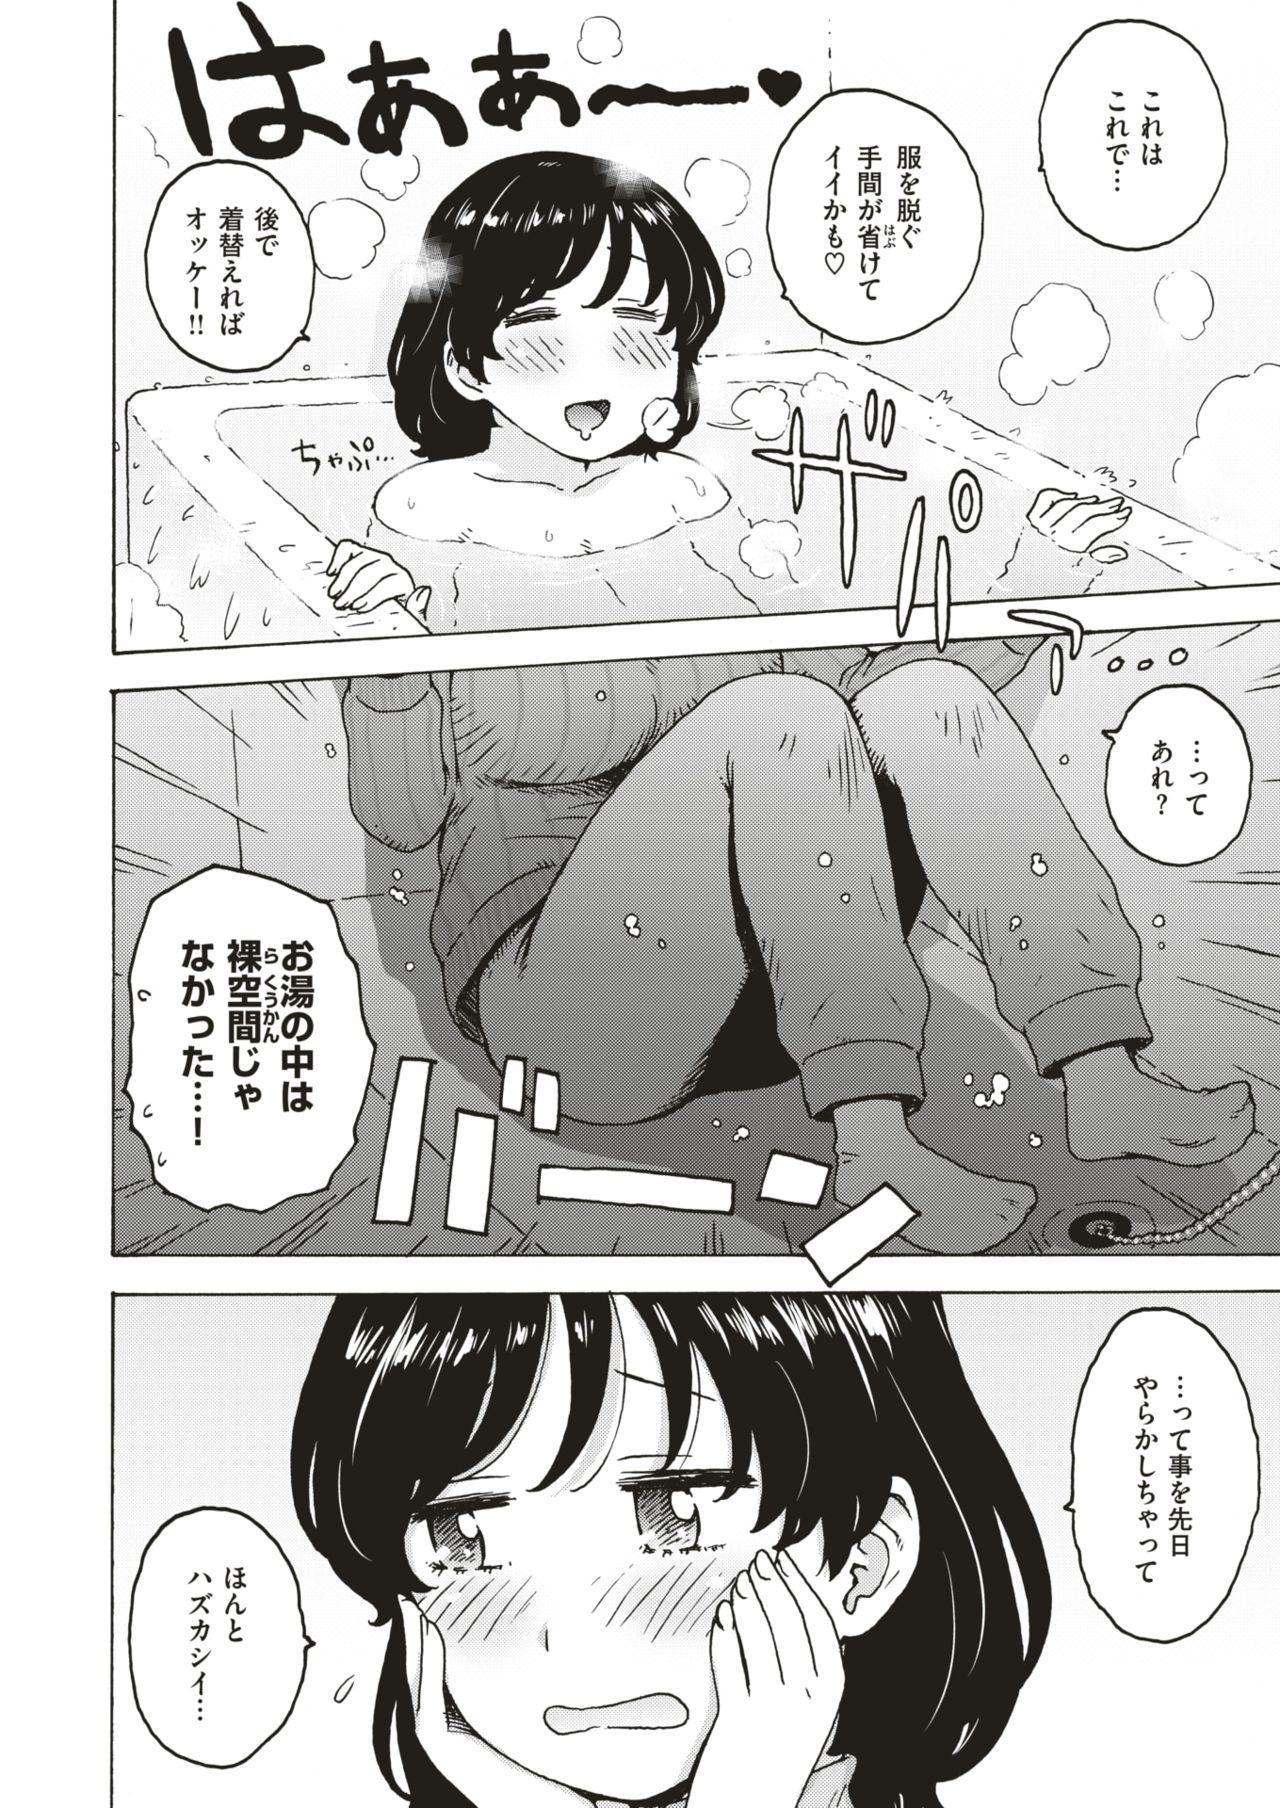 COMIC HAPPINING Vol. 4 36